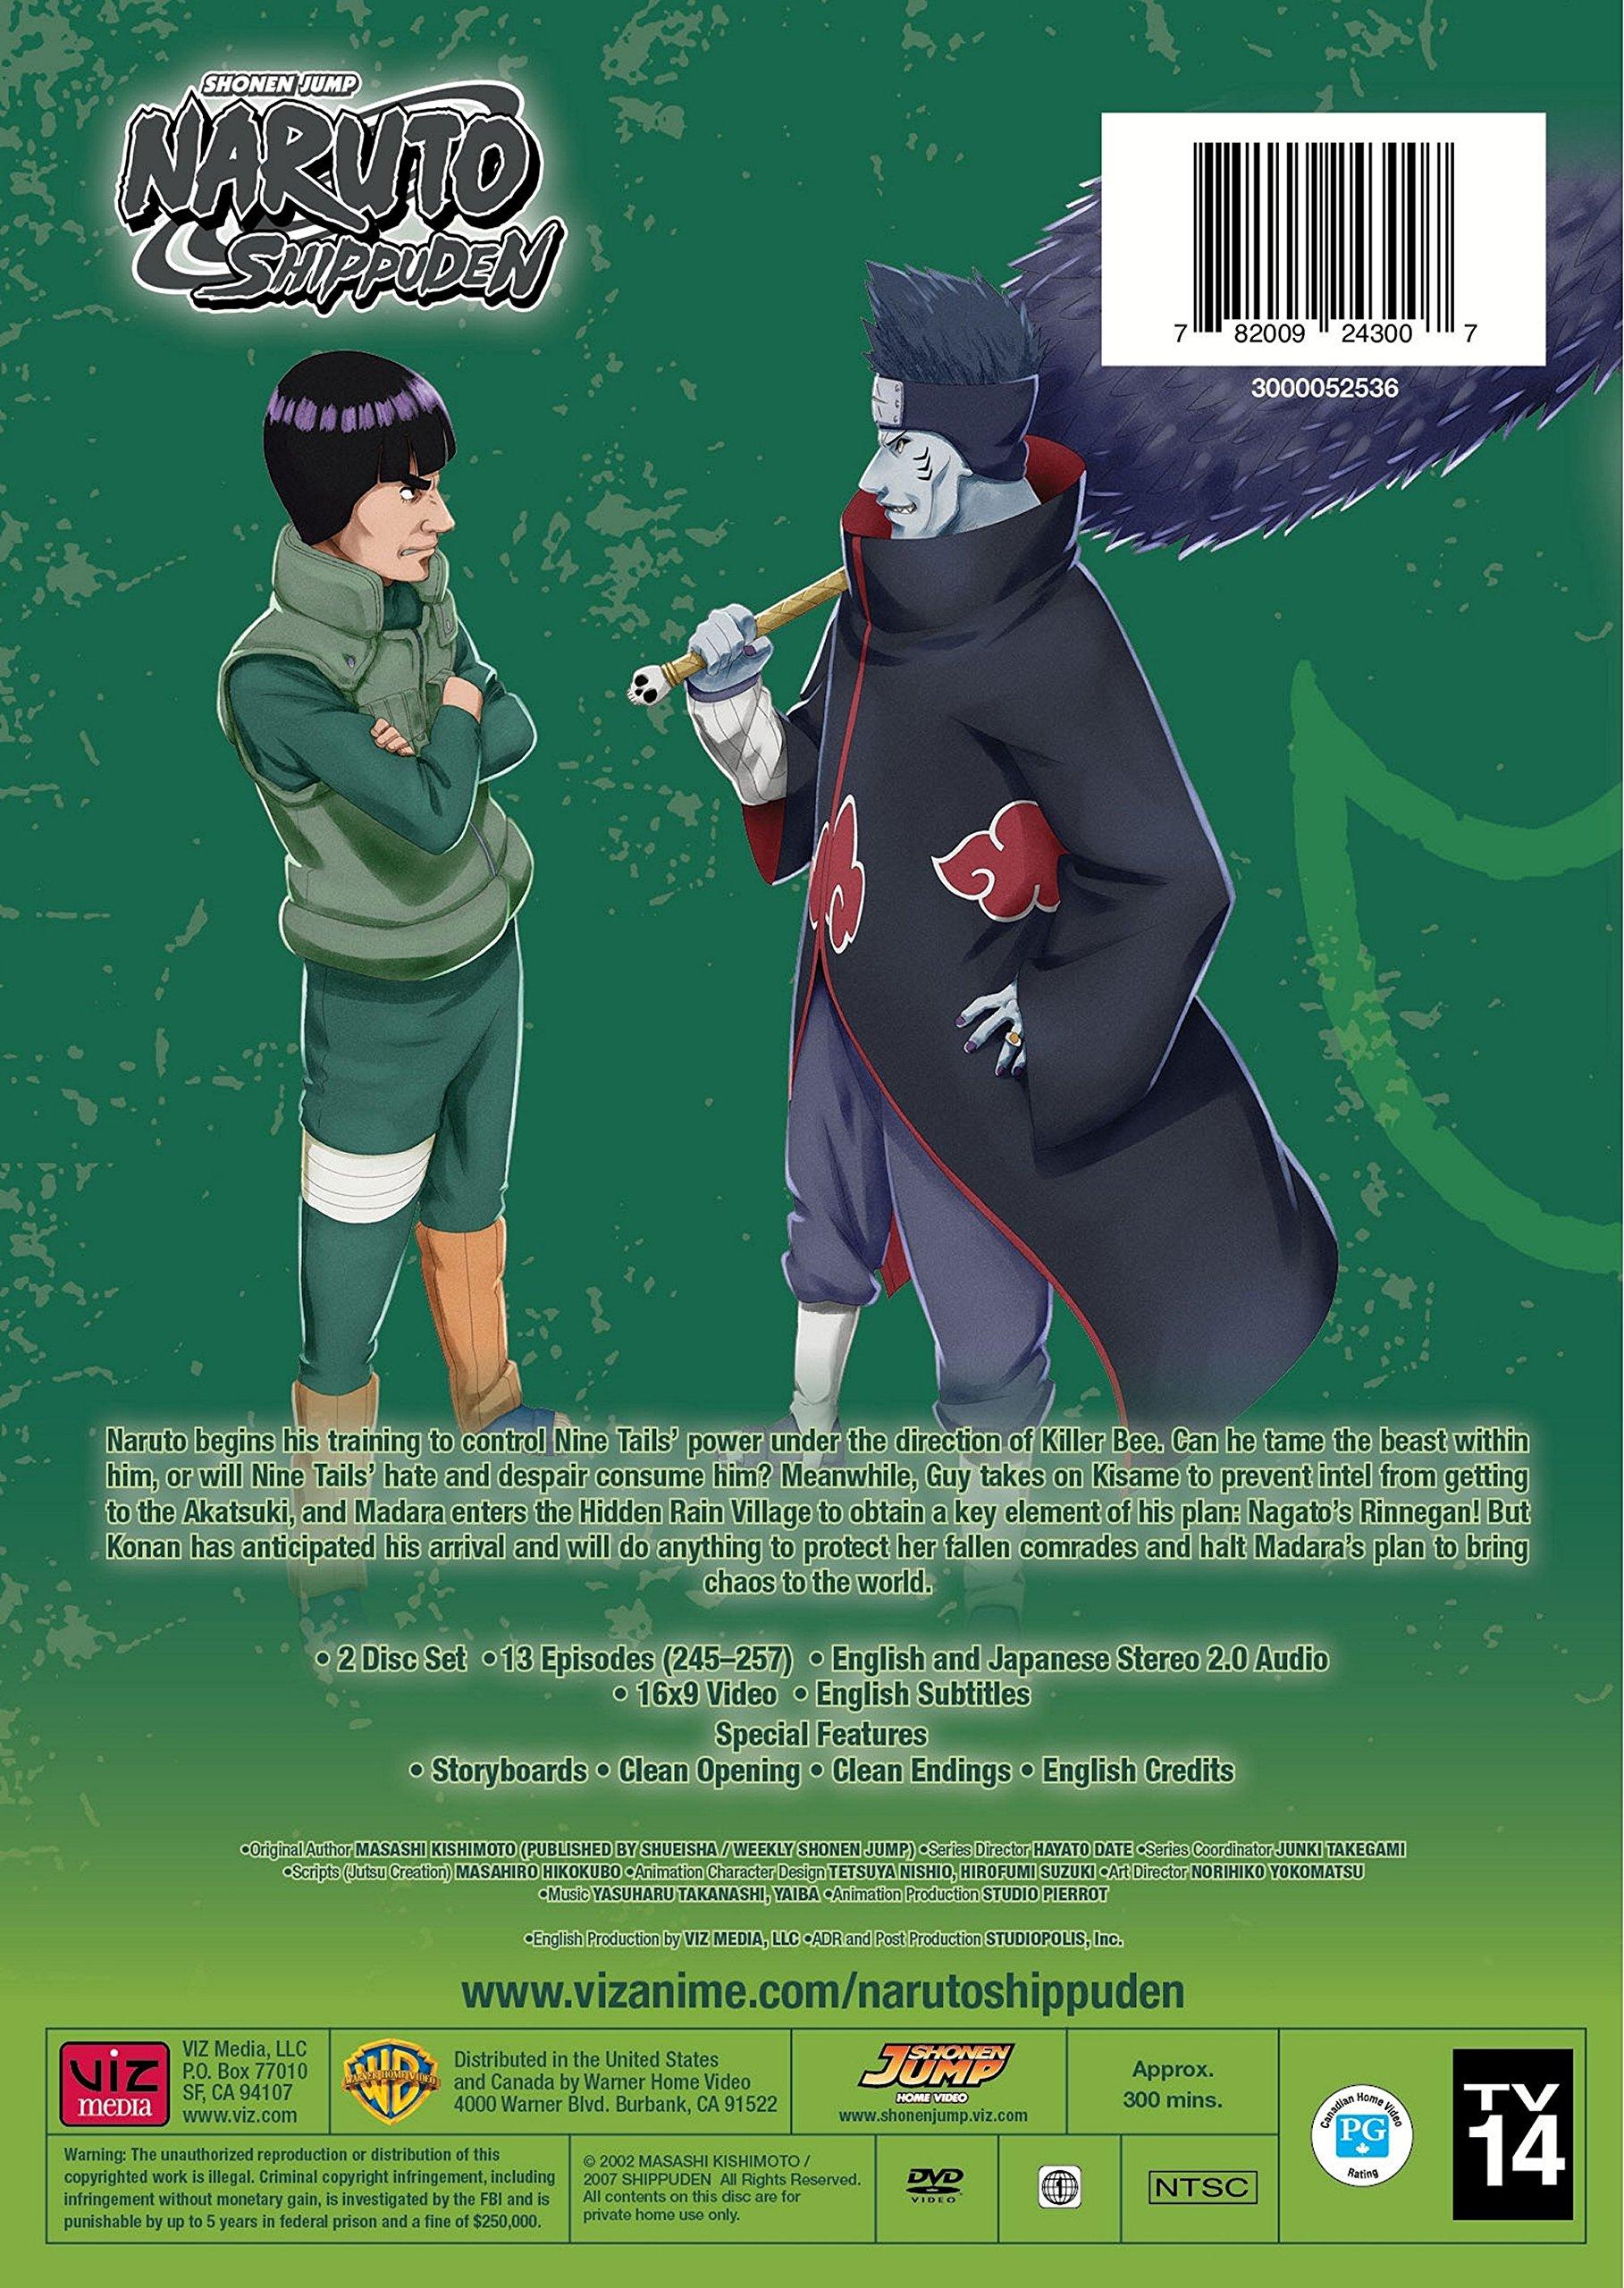 Naruto Shippuden: Set 20 - Fandom Post Forums